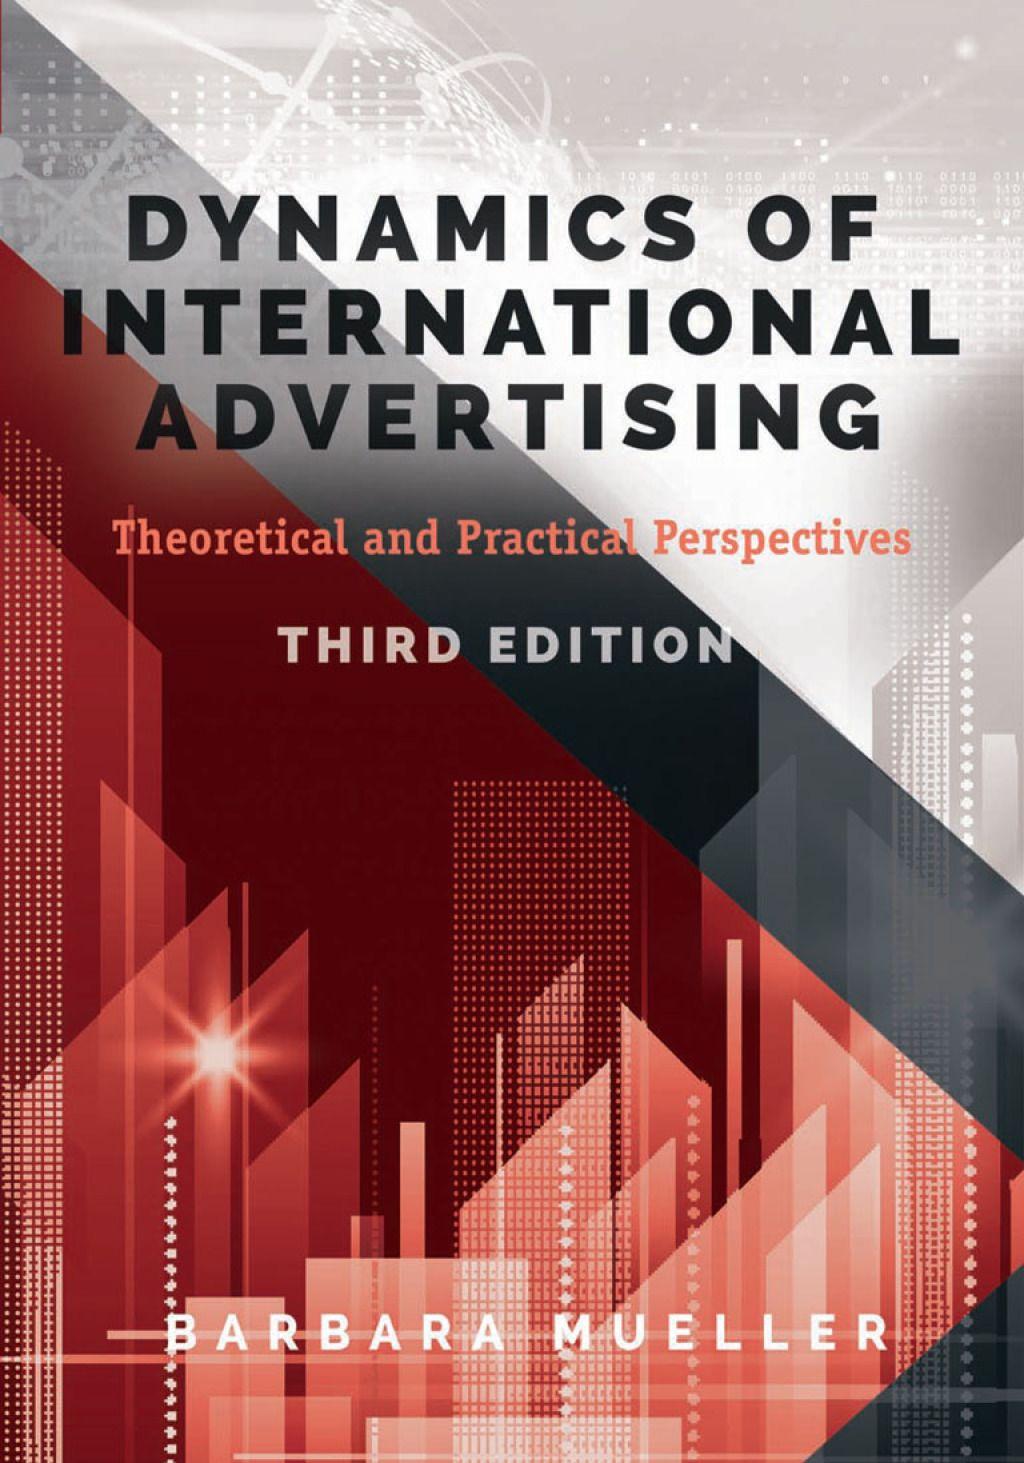 Dynamics Of International Advertising Ebook In 2020 Digital Storytelling Free Books Download Free Ebooks Download